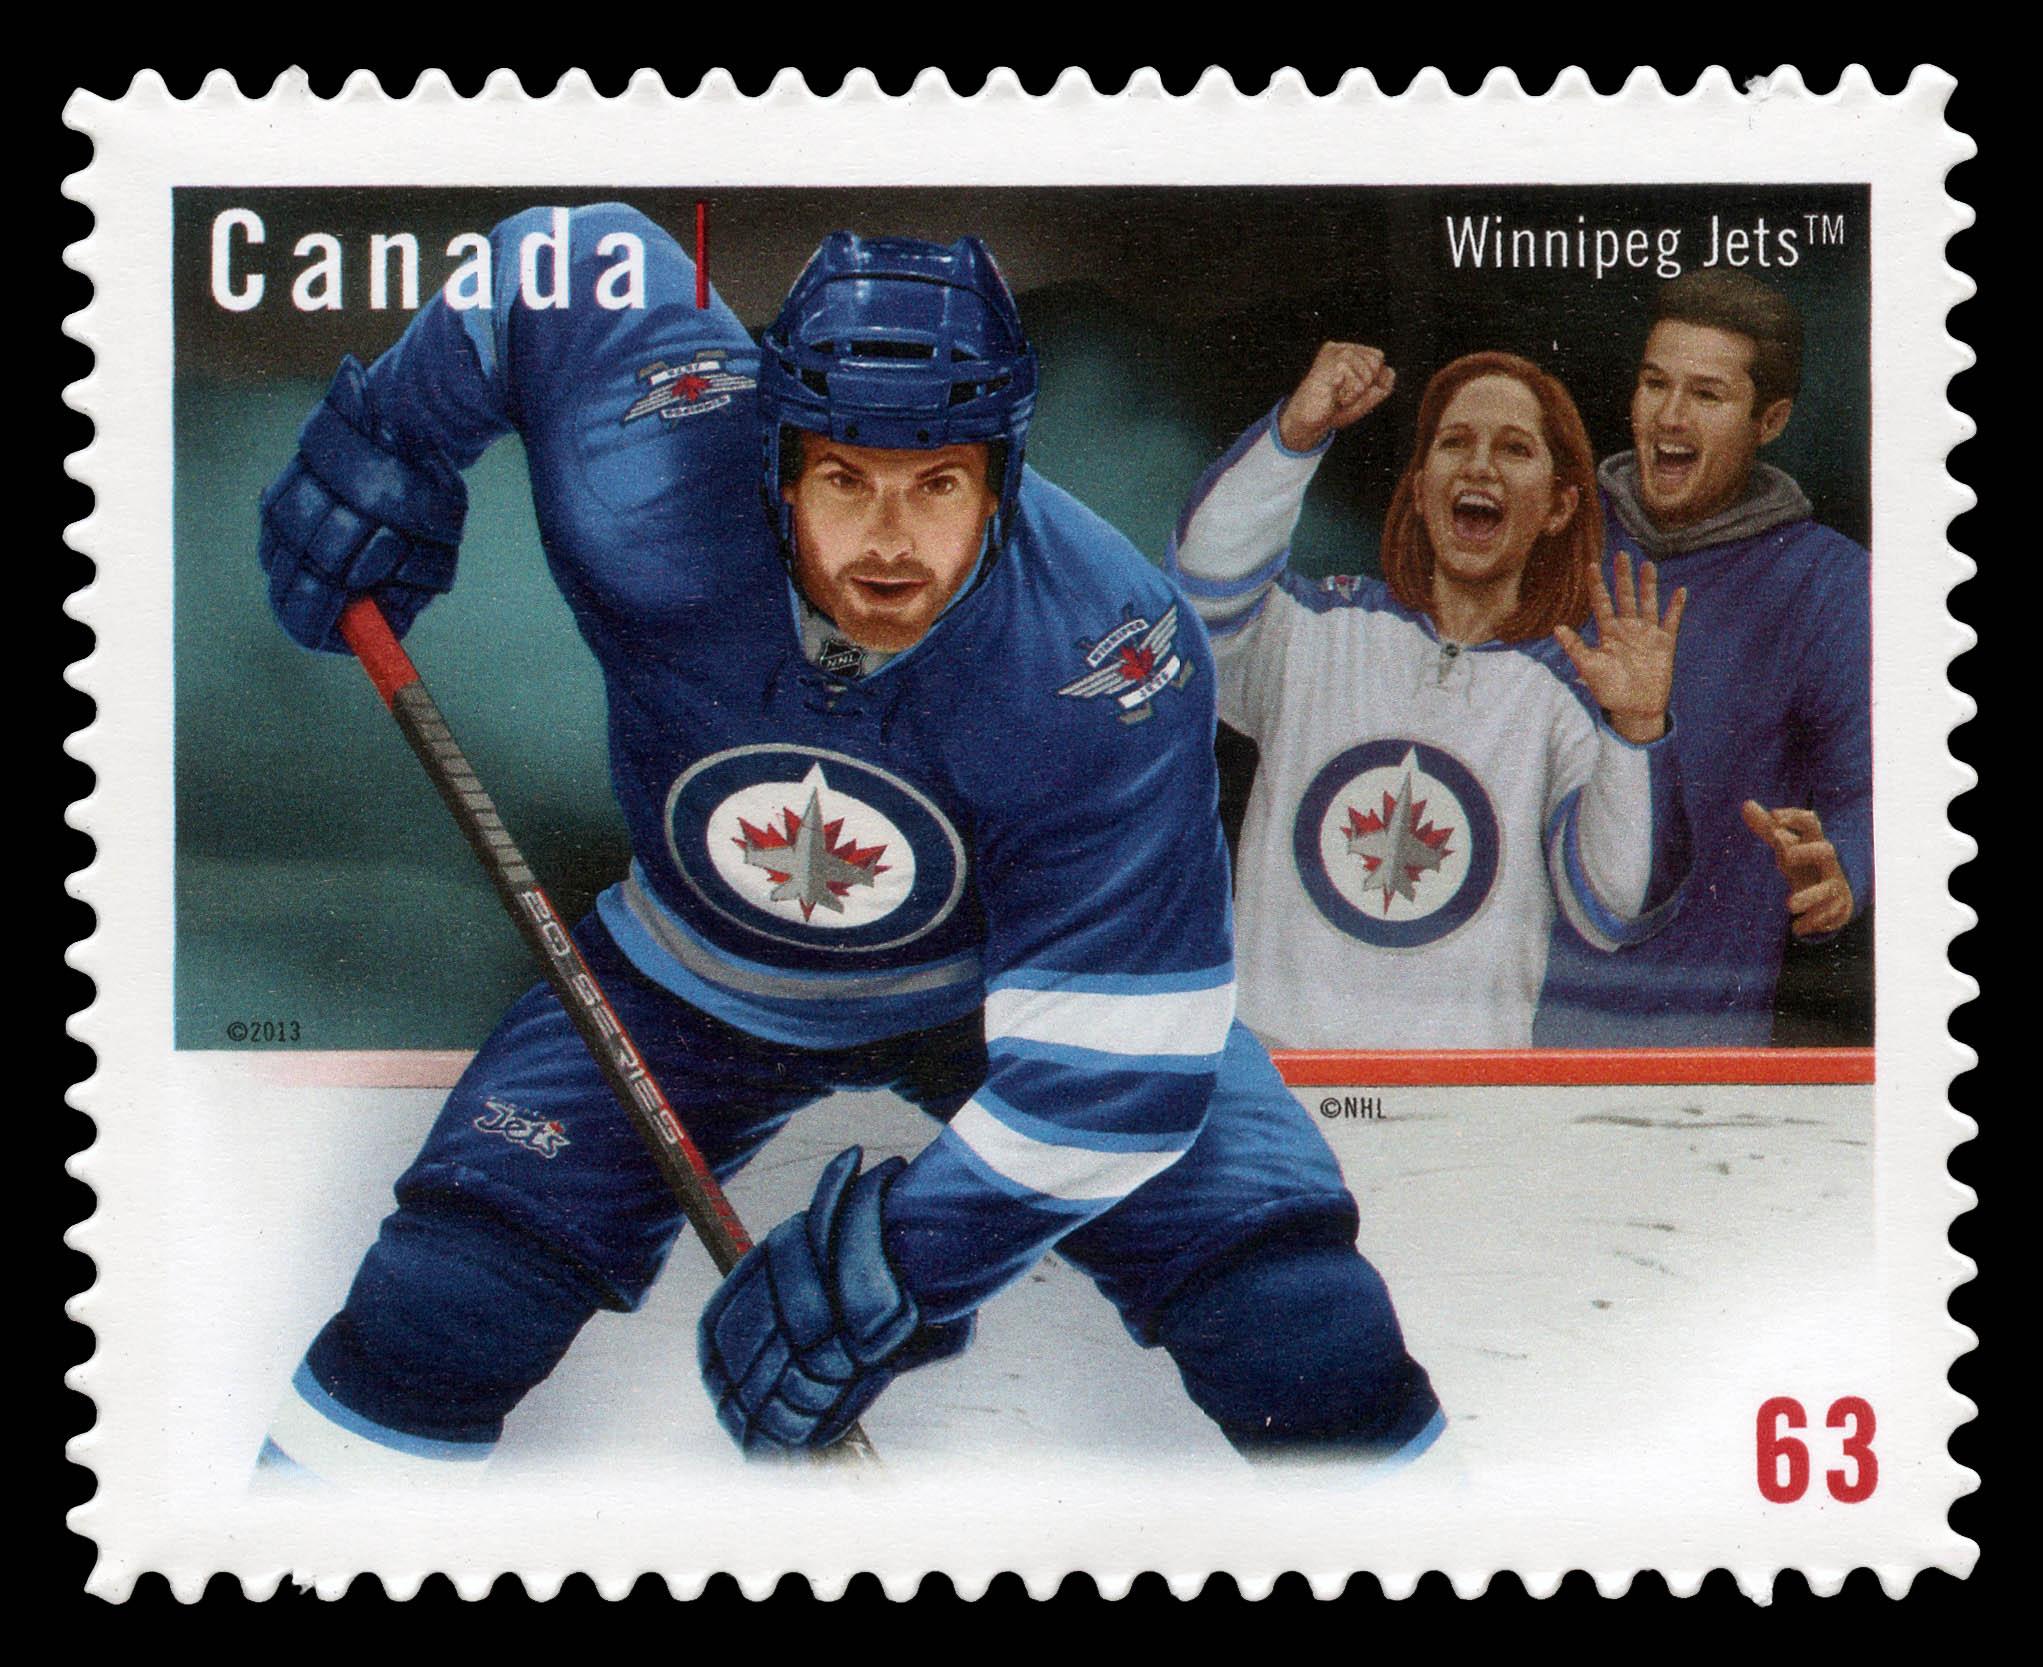 Winnipeg Jets Canada Postage Stamp | NHL® Team Jerseys